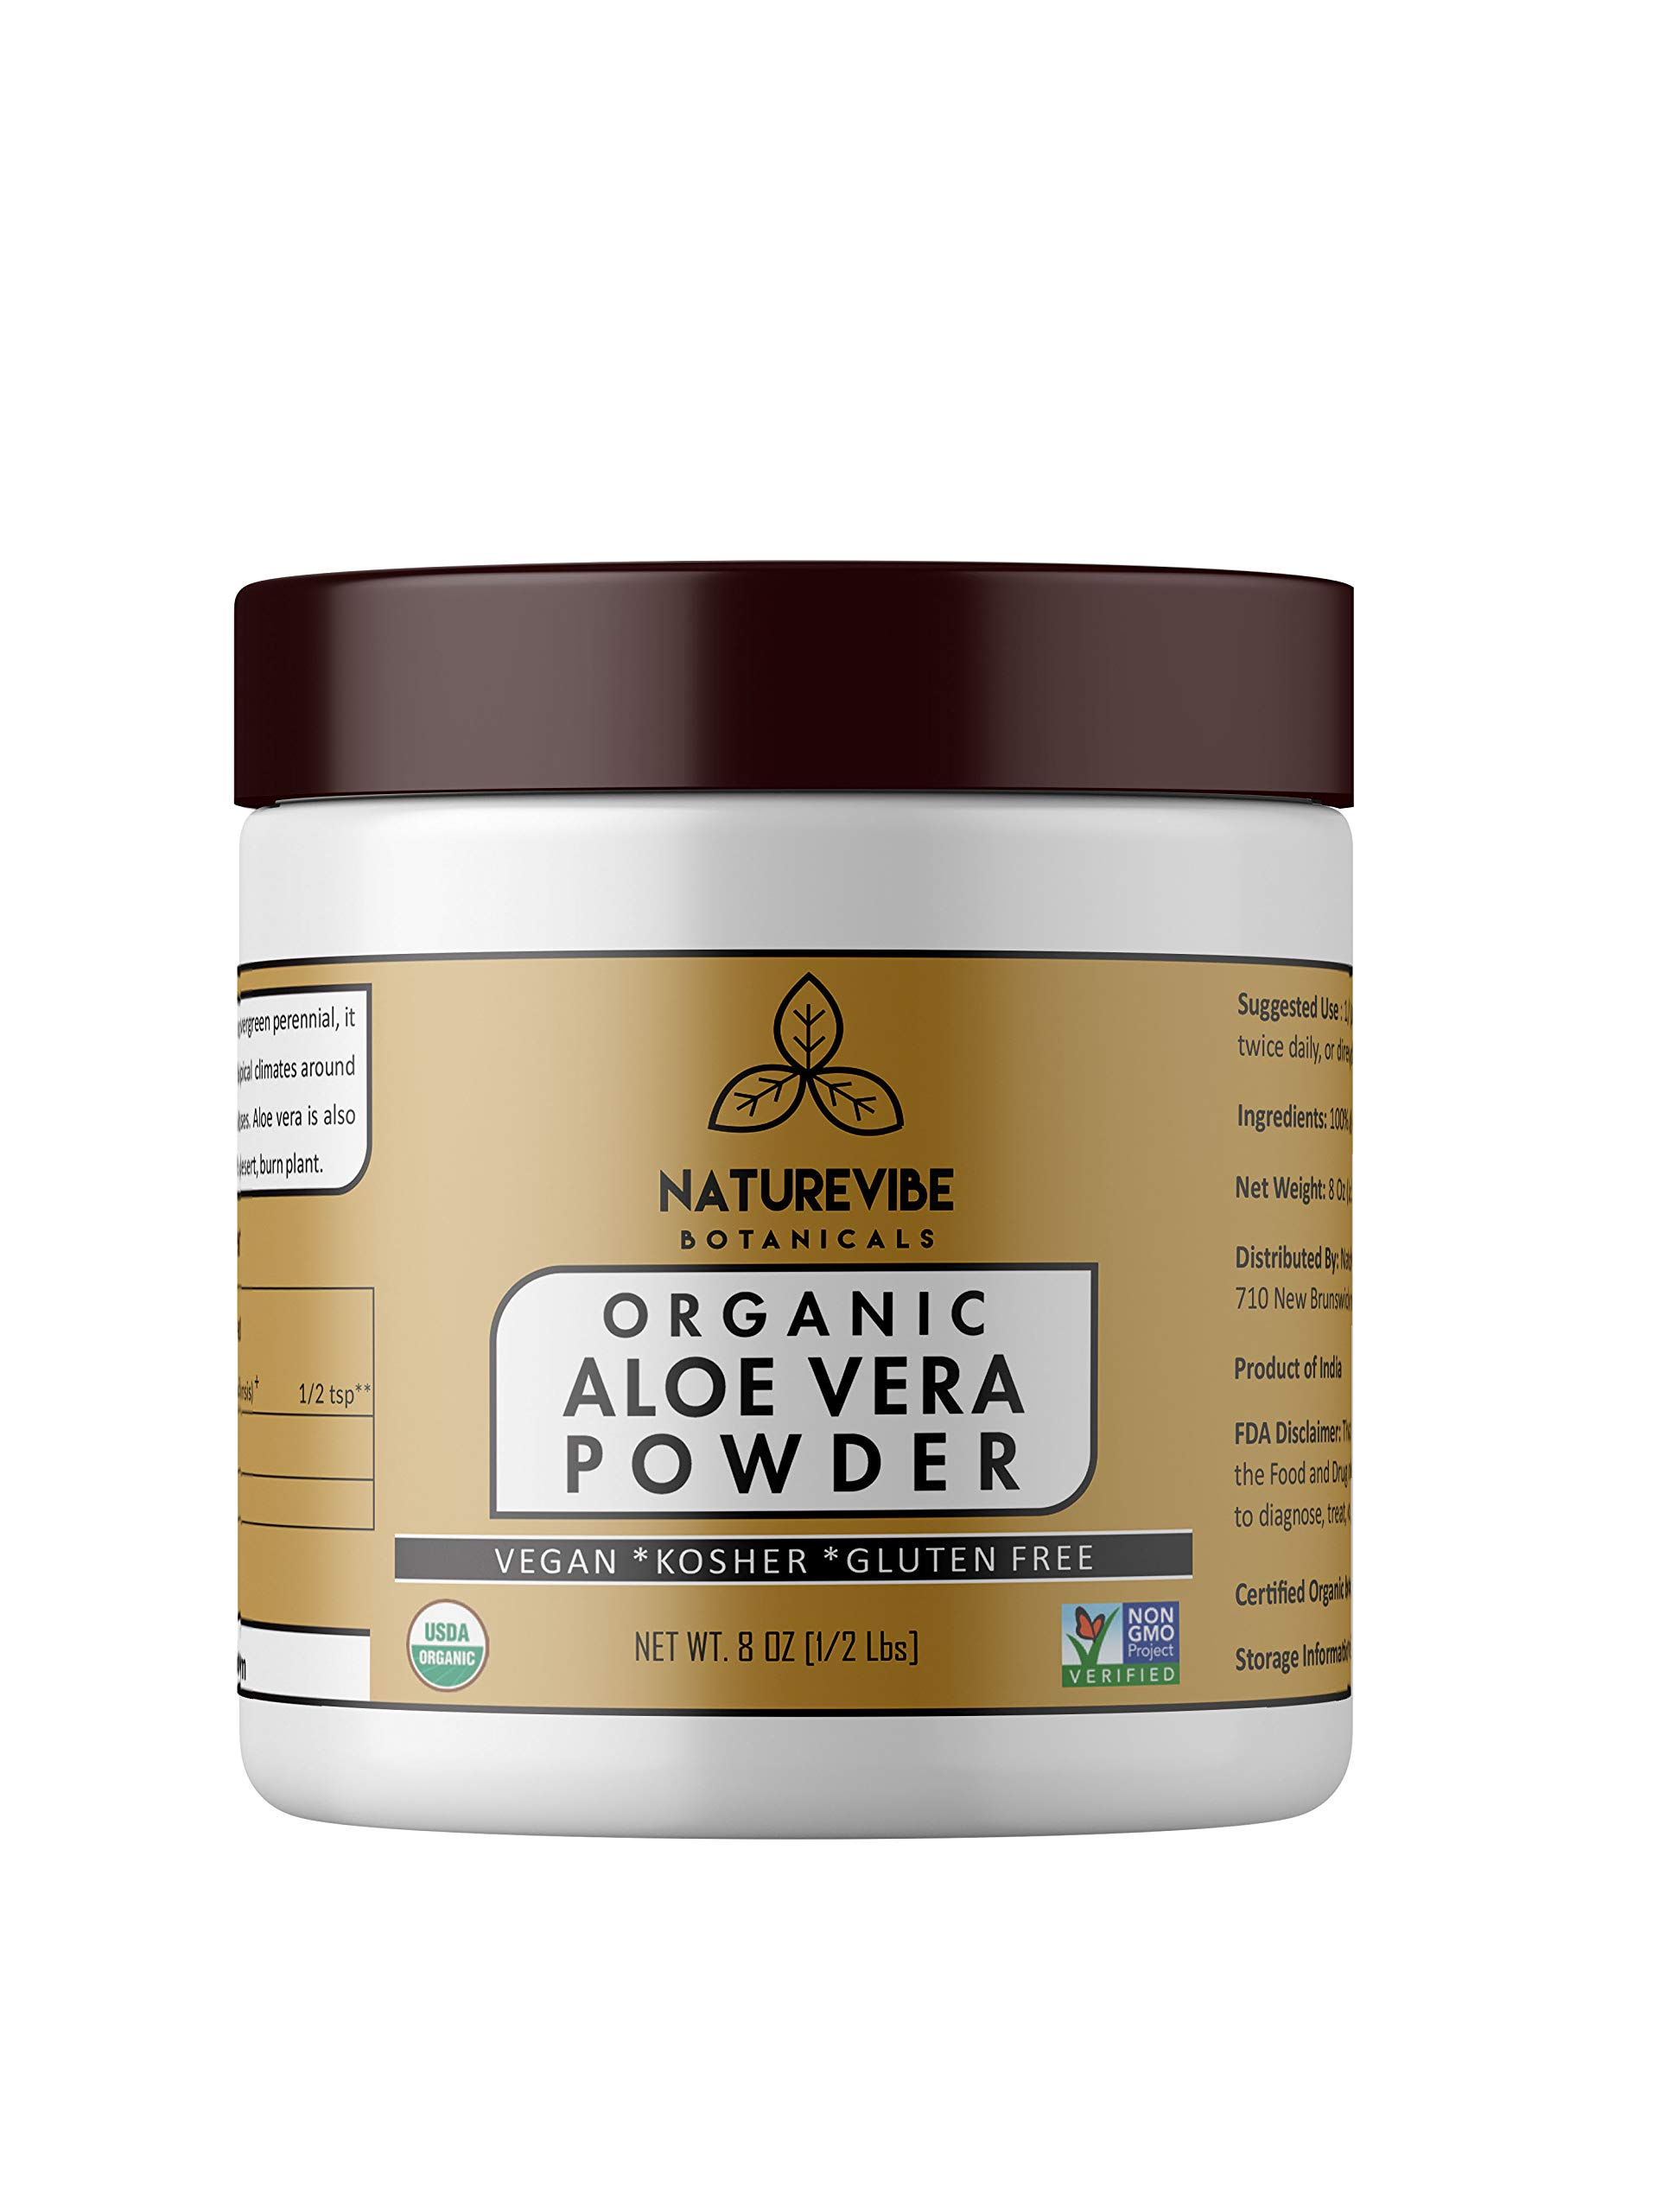 Organic Aloe Vera Leaf Powder (8 Ounce) - Aloe Barbadensis - USDA Certified Organic   Hair Care   Promotes Skin Health   Ayurvedic Herbal Supplement   Supports Immune System